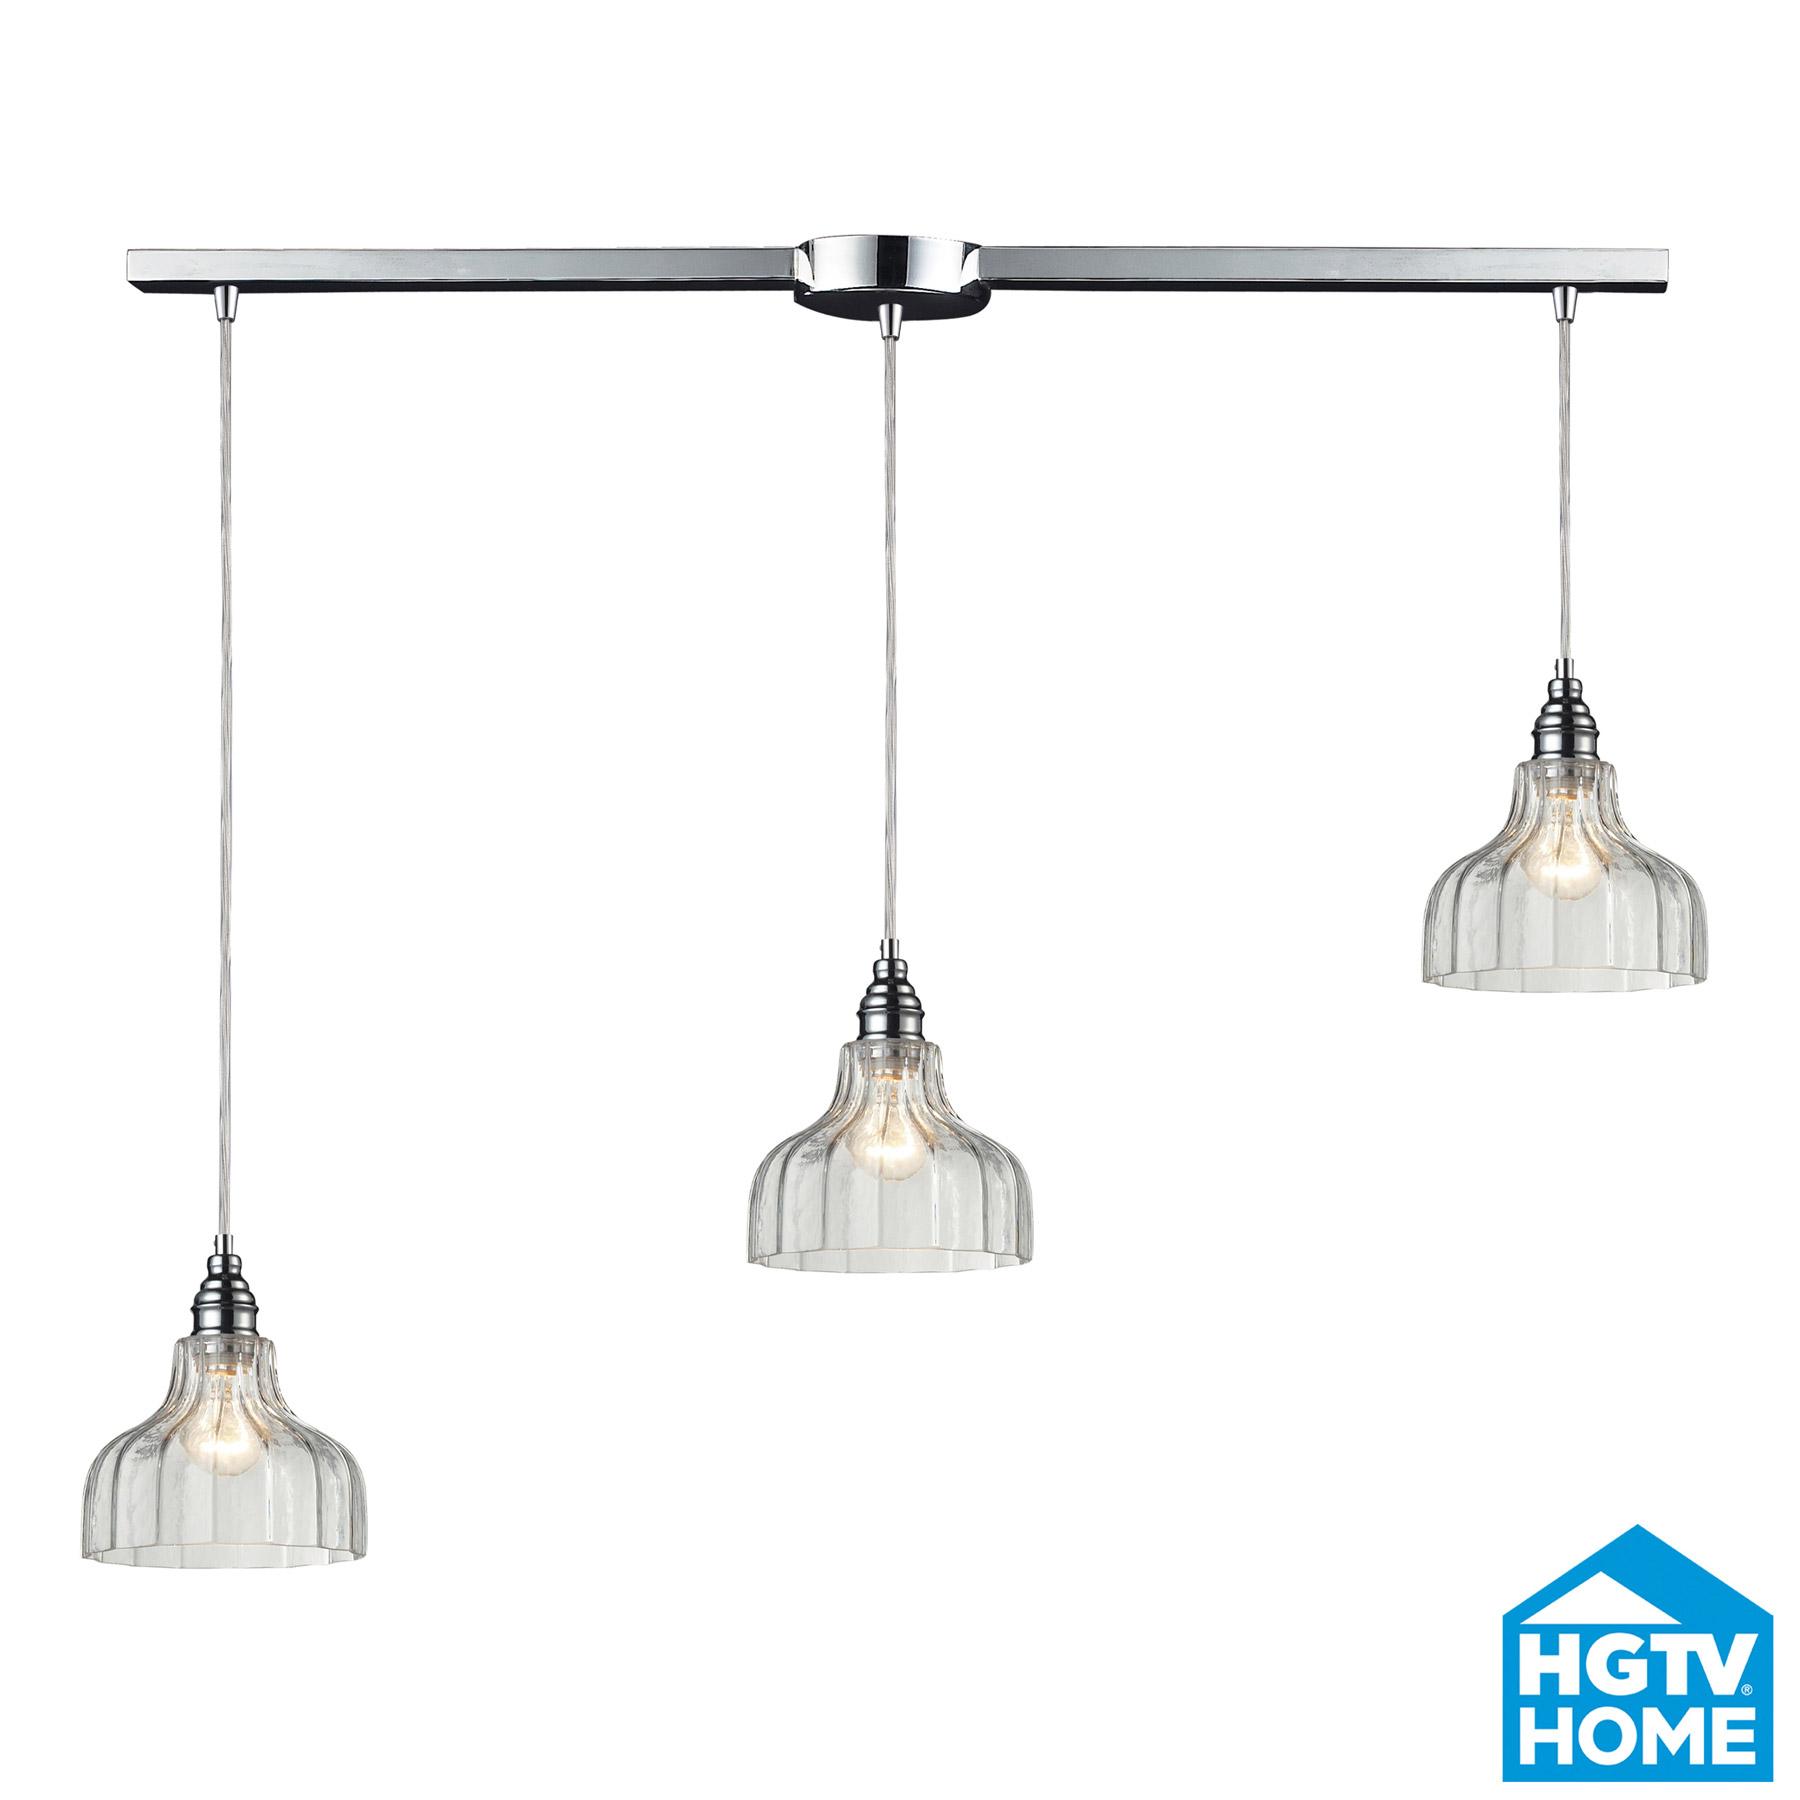 elk lighting 46018 3l danica linear multi pendant ceiling